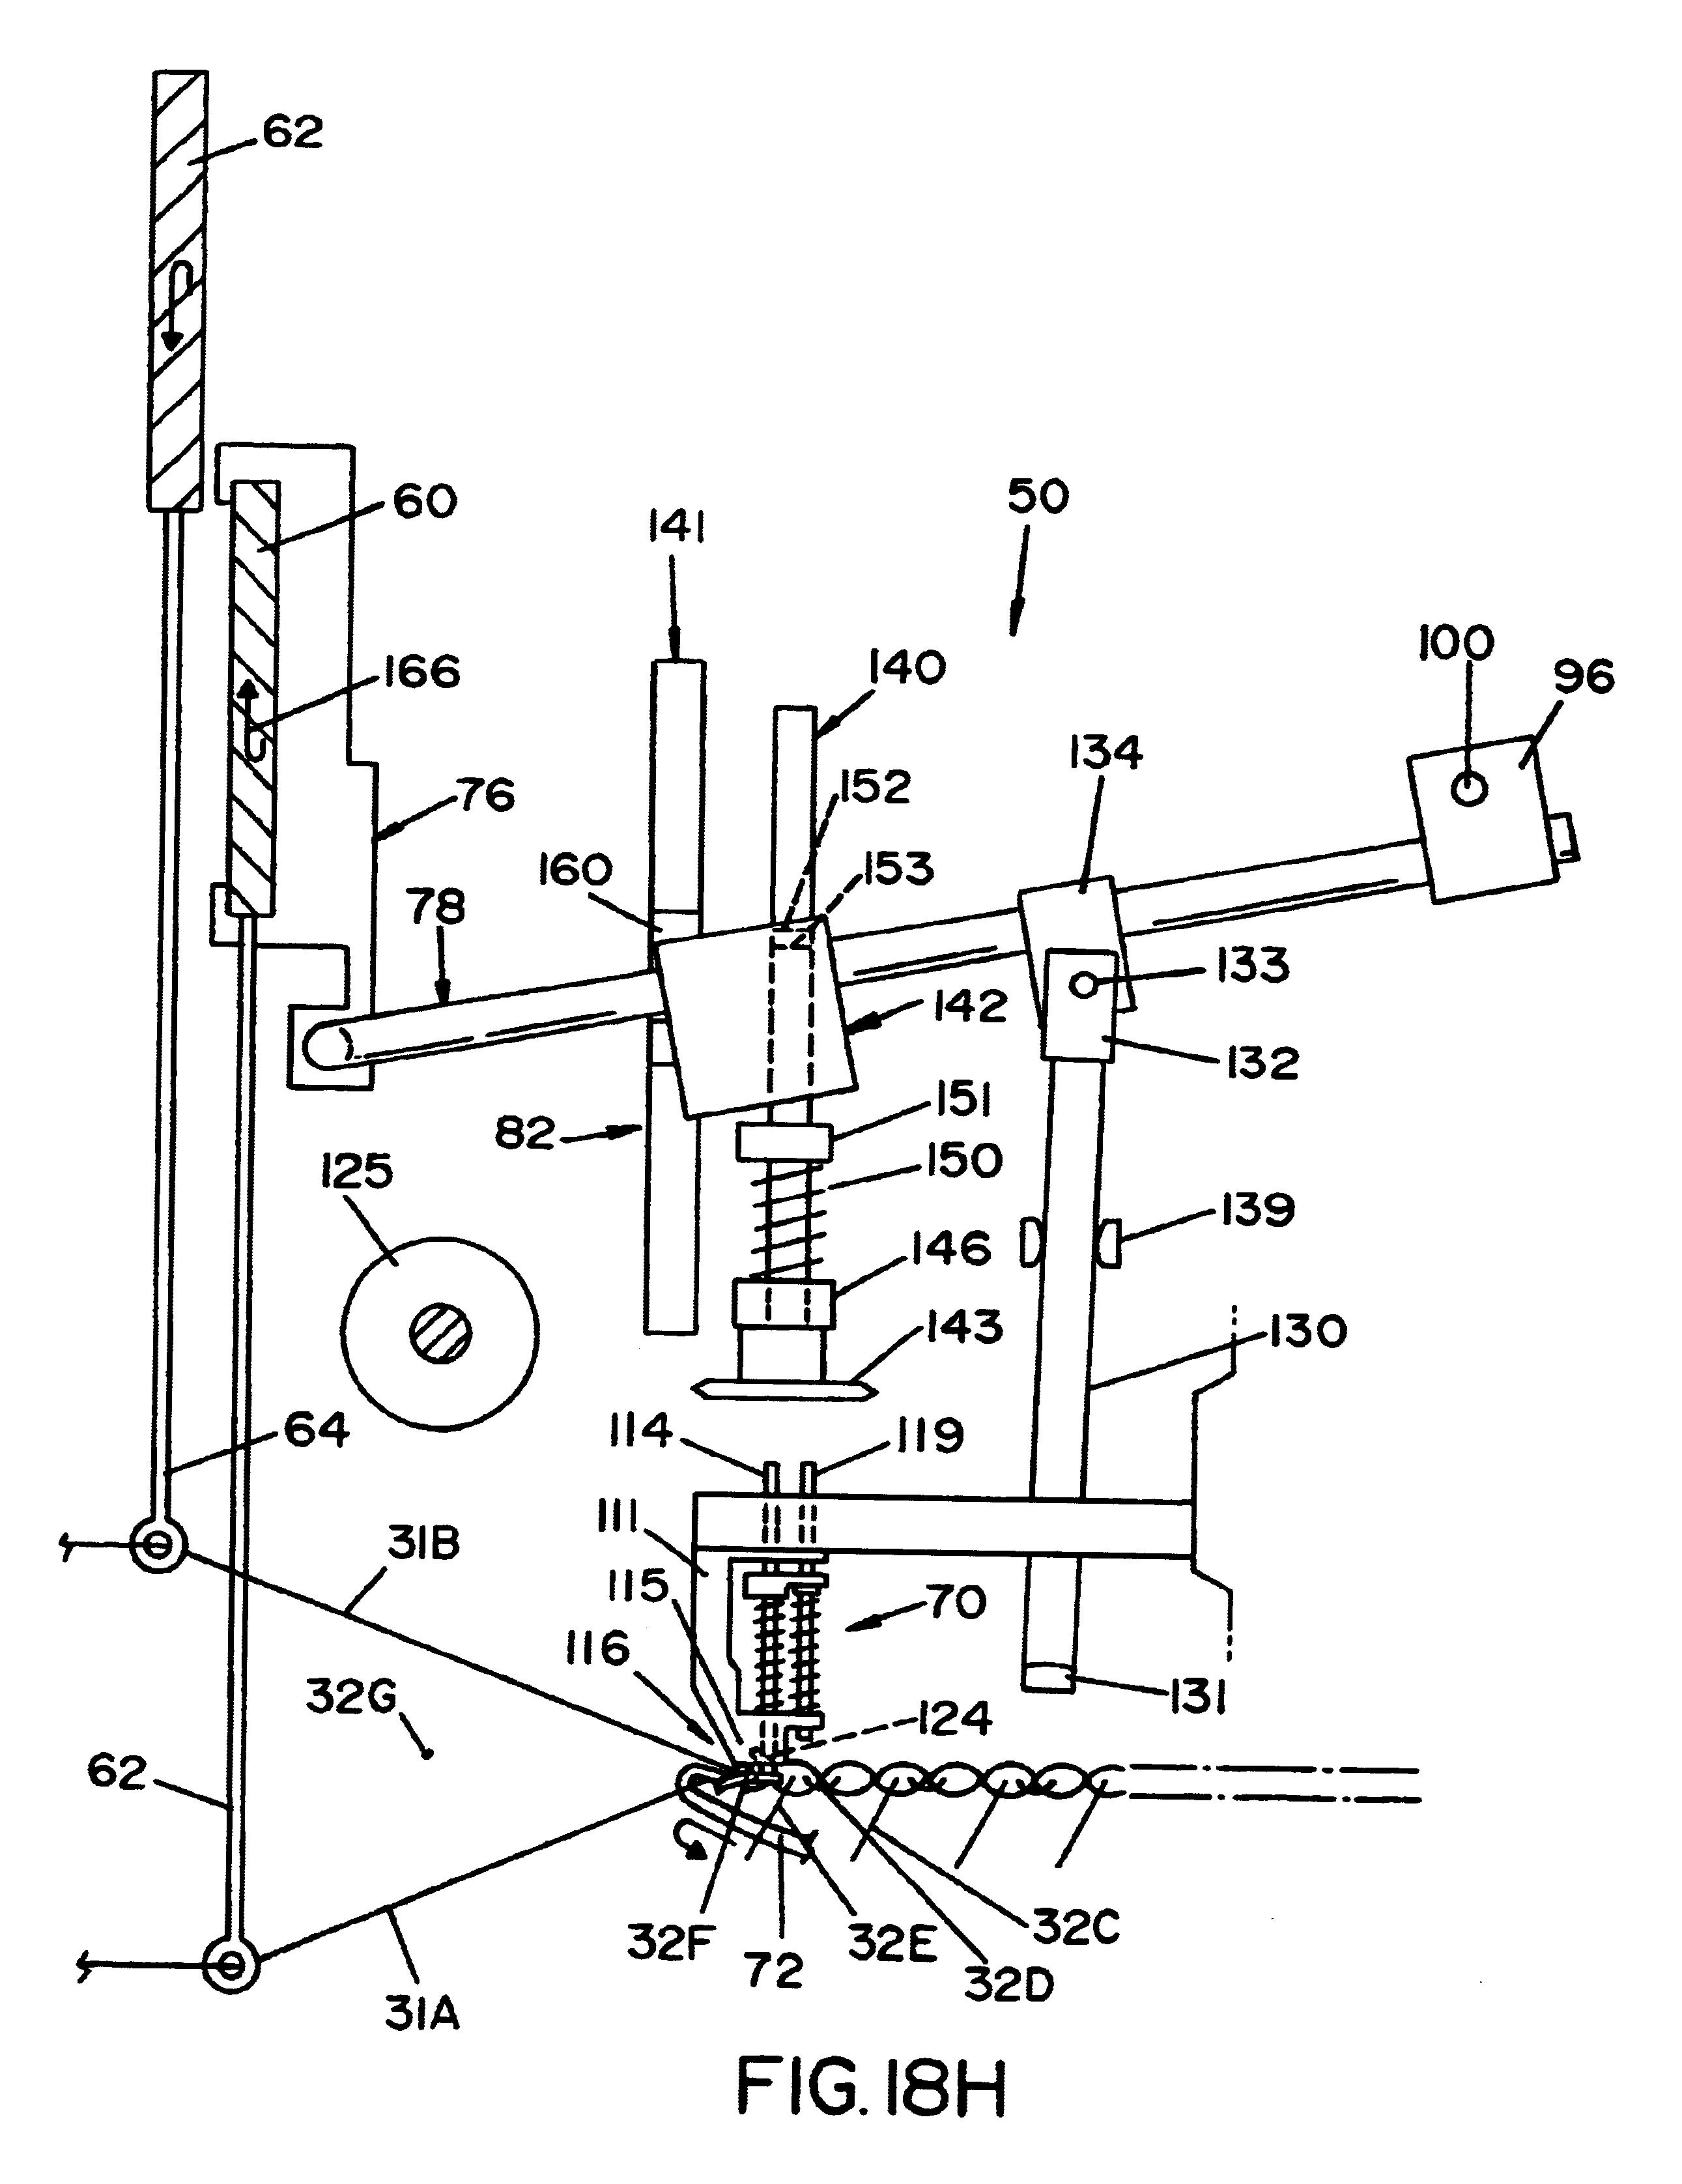 infiniti air bag schematic diagram online wiring diagram Peugeot 807 Review air bag schematic wiring diagram databaseairbag schematic fabric diagram best wiring library air bag system diagram